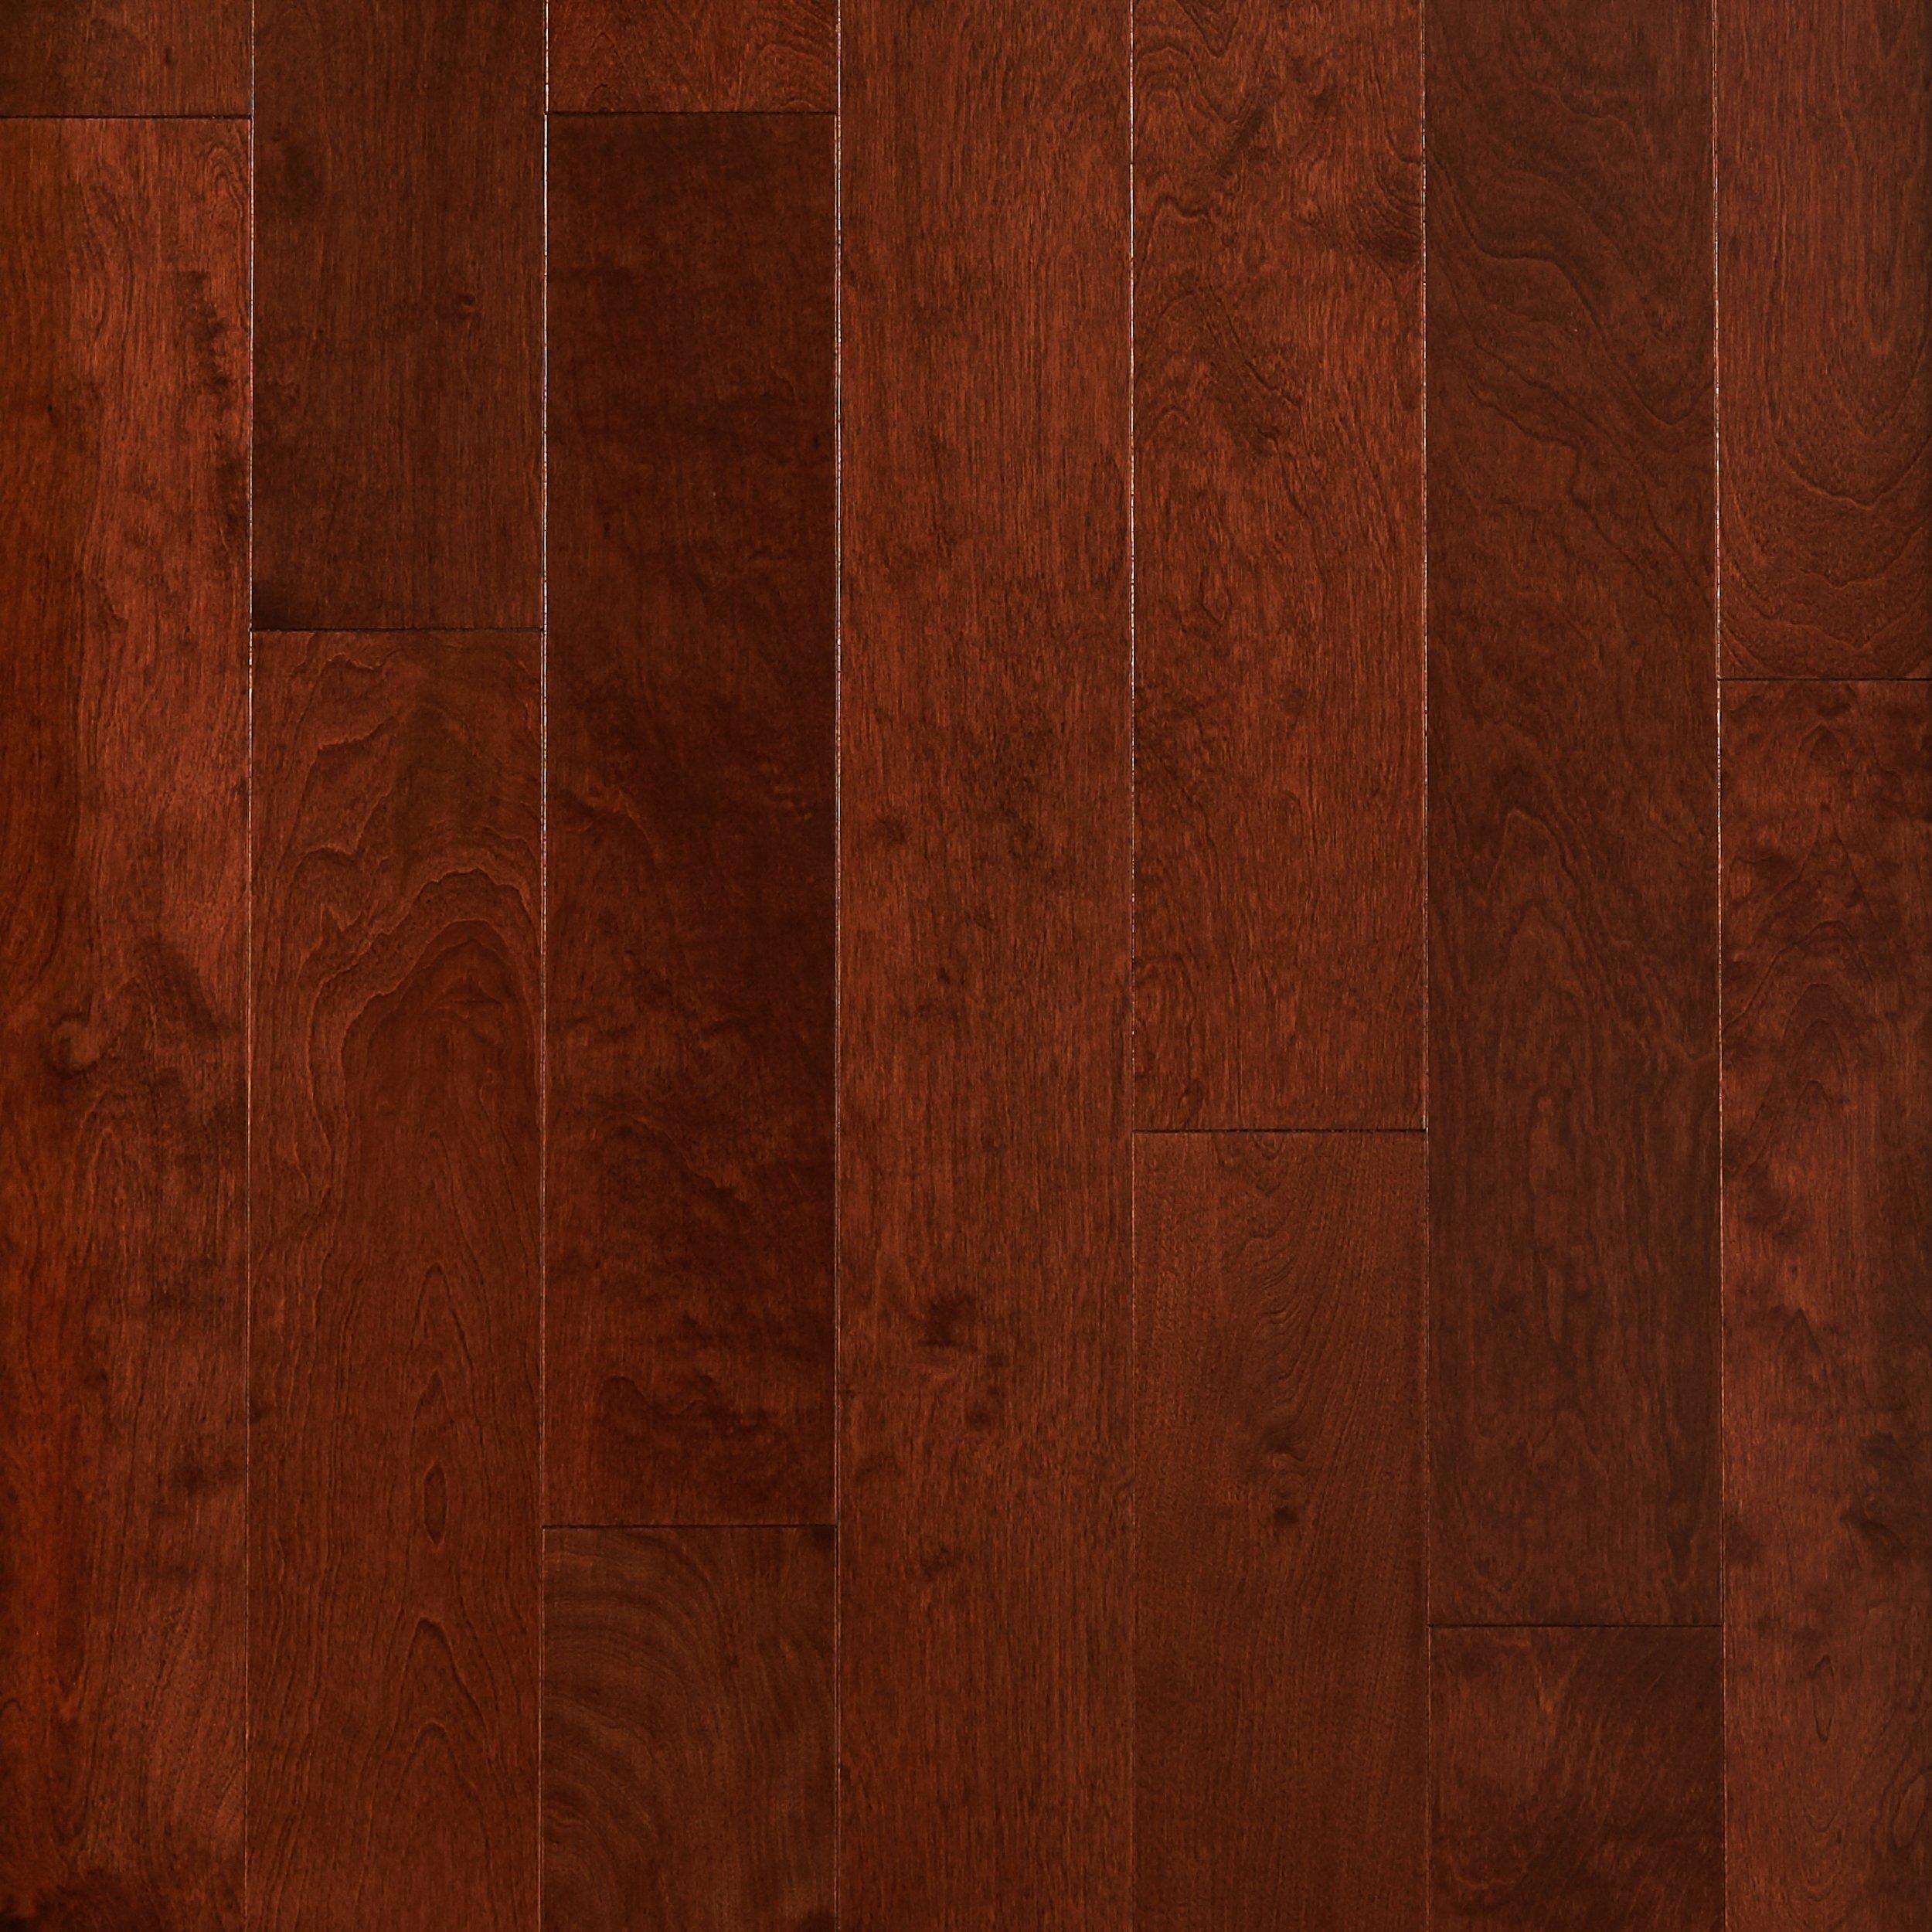 Amazing Cherry Birch Smooth Engineered Hardwood   3/8in. X 5in.   941200106 | Floor  And Decor